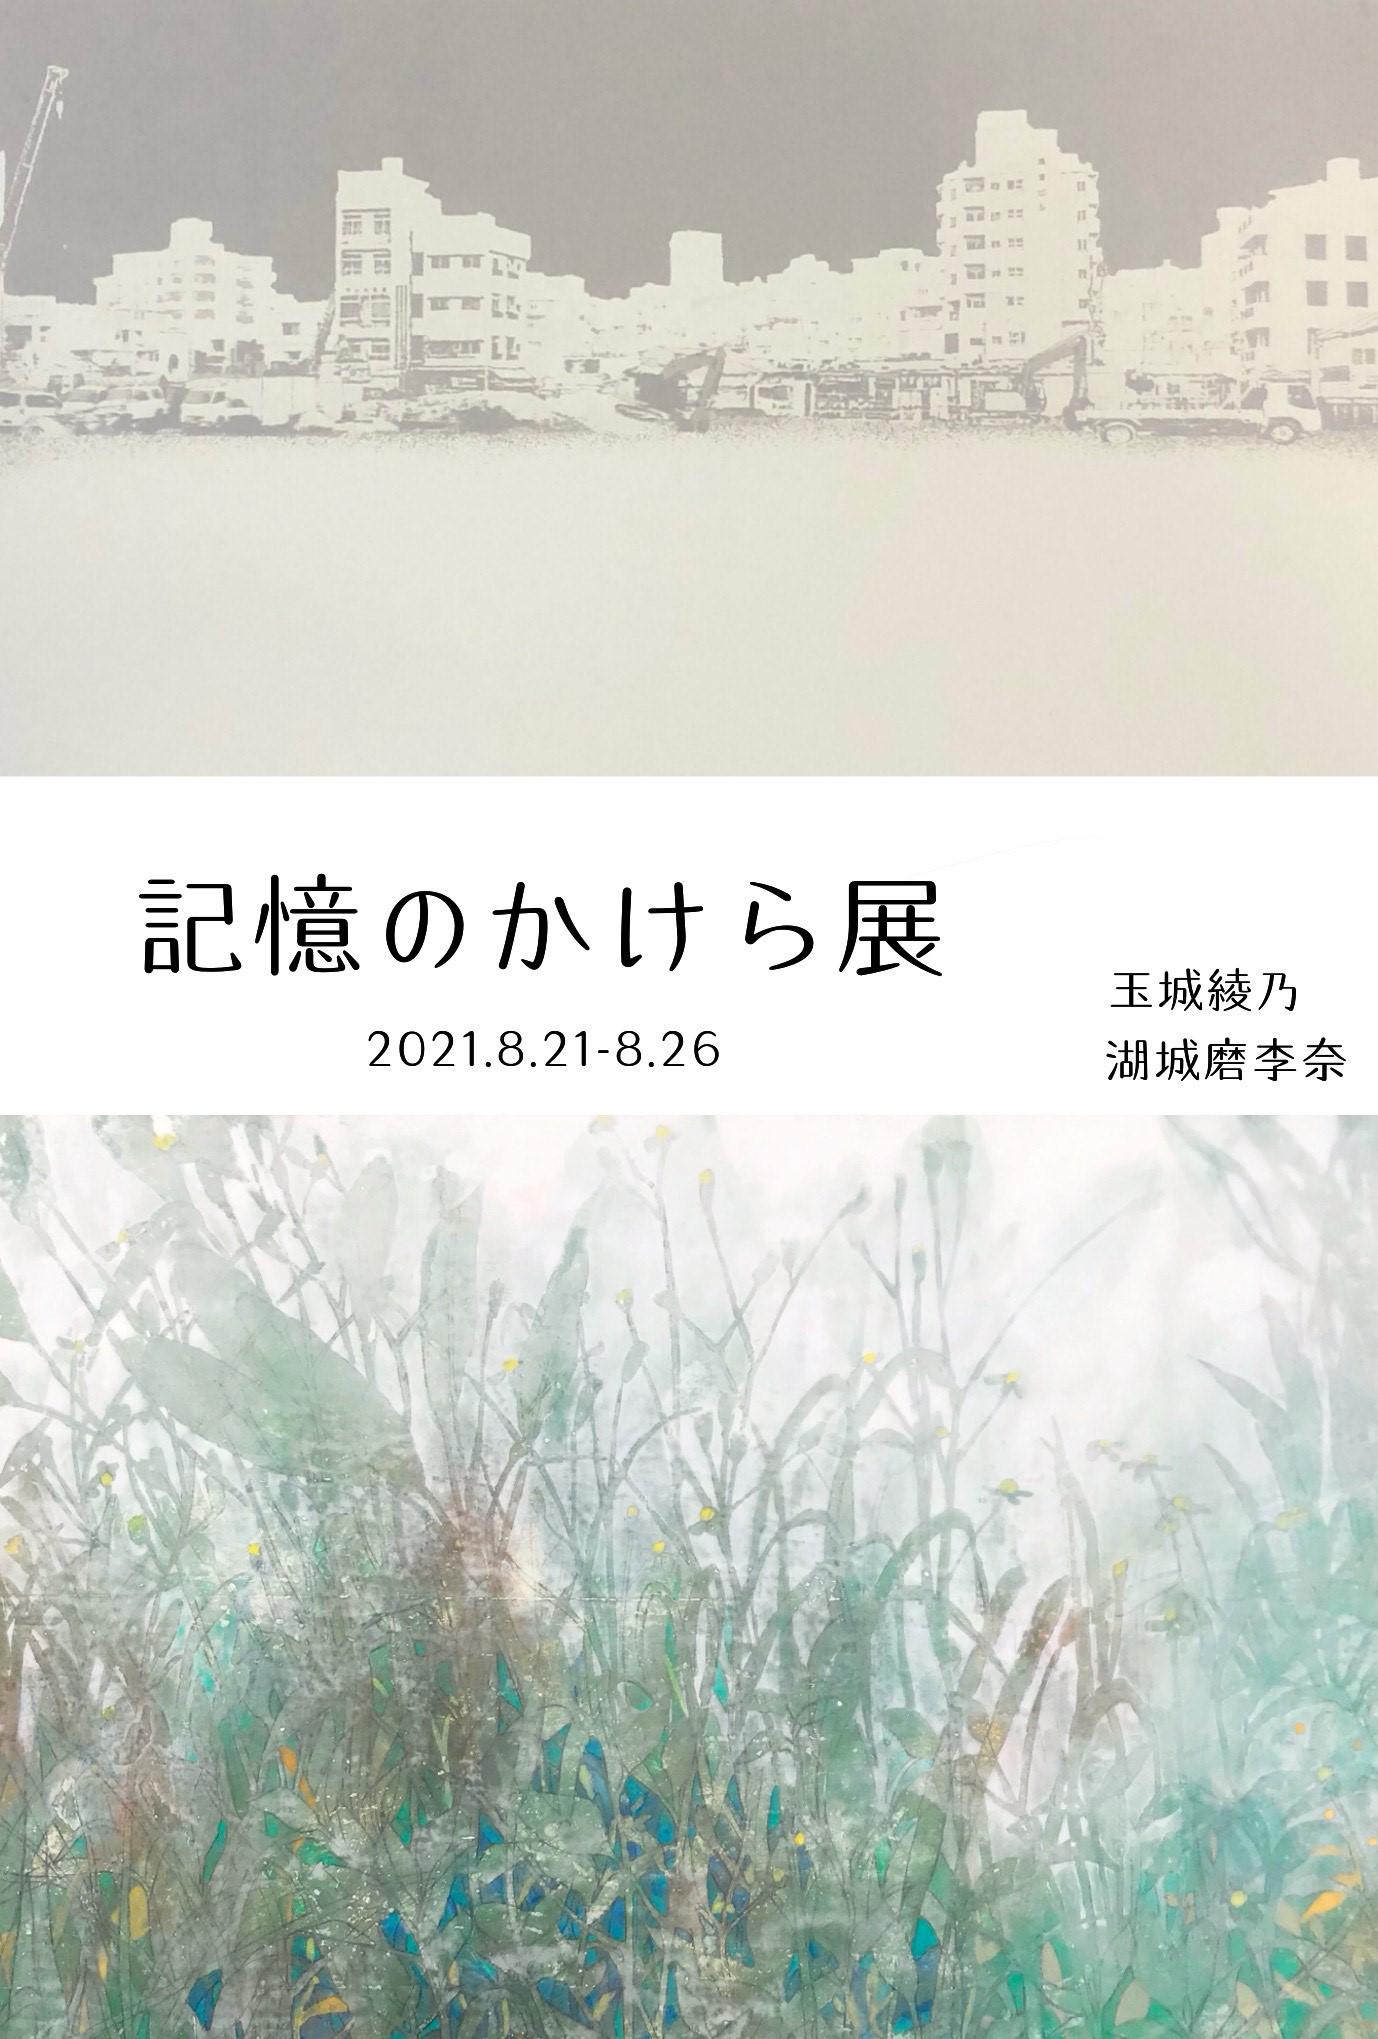 http://www.okigei.ac.jp/wp-content/uploads/2021/08/kiokunokakera.jpg